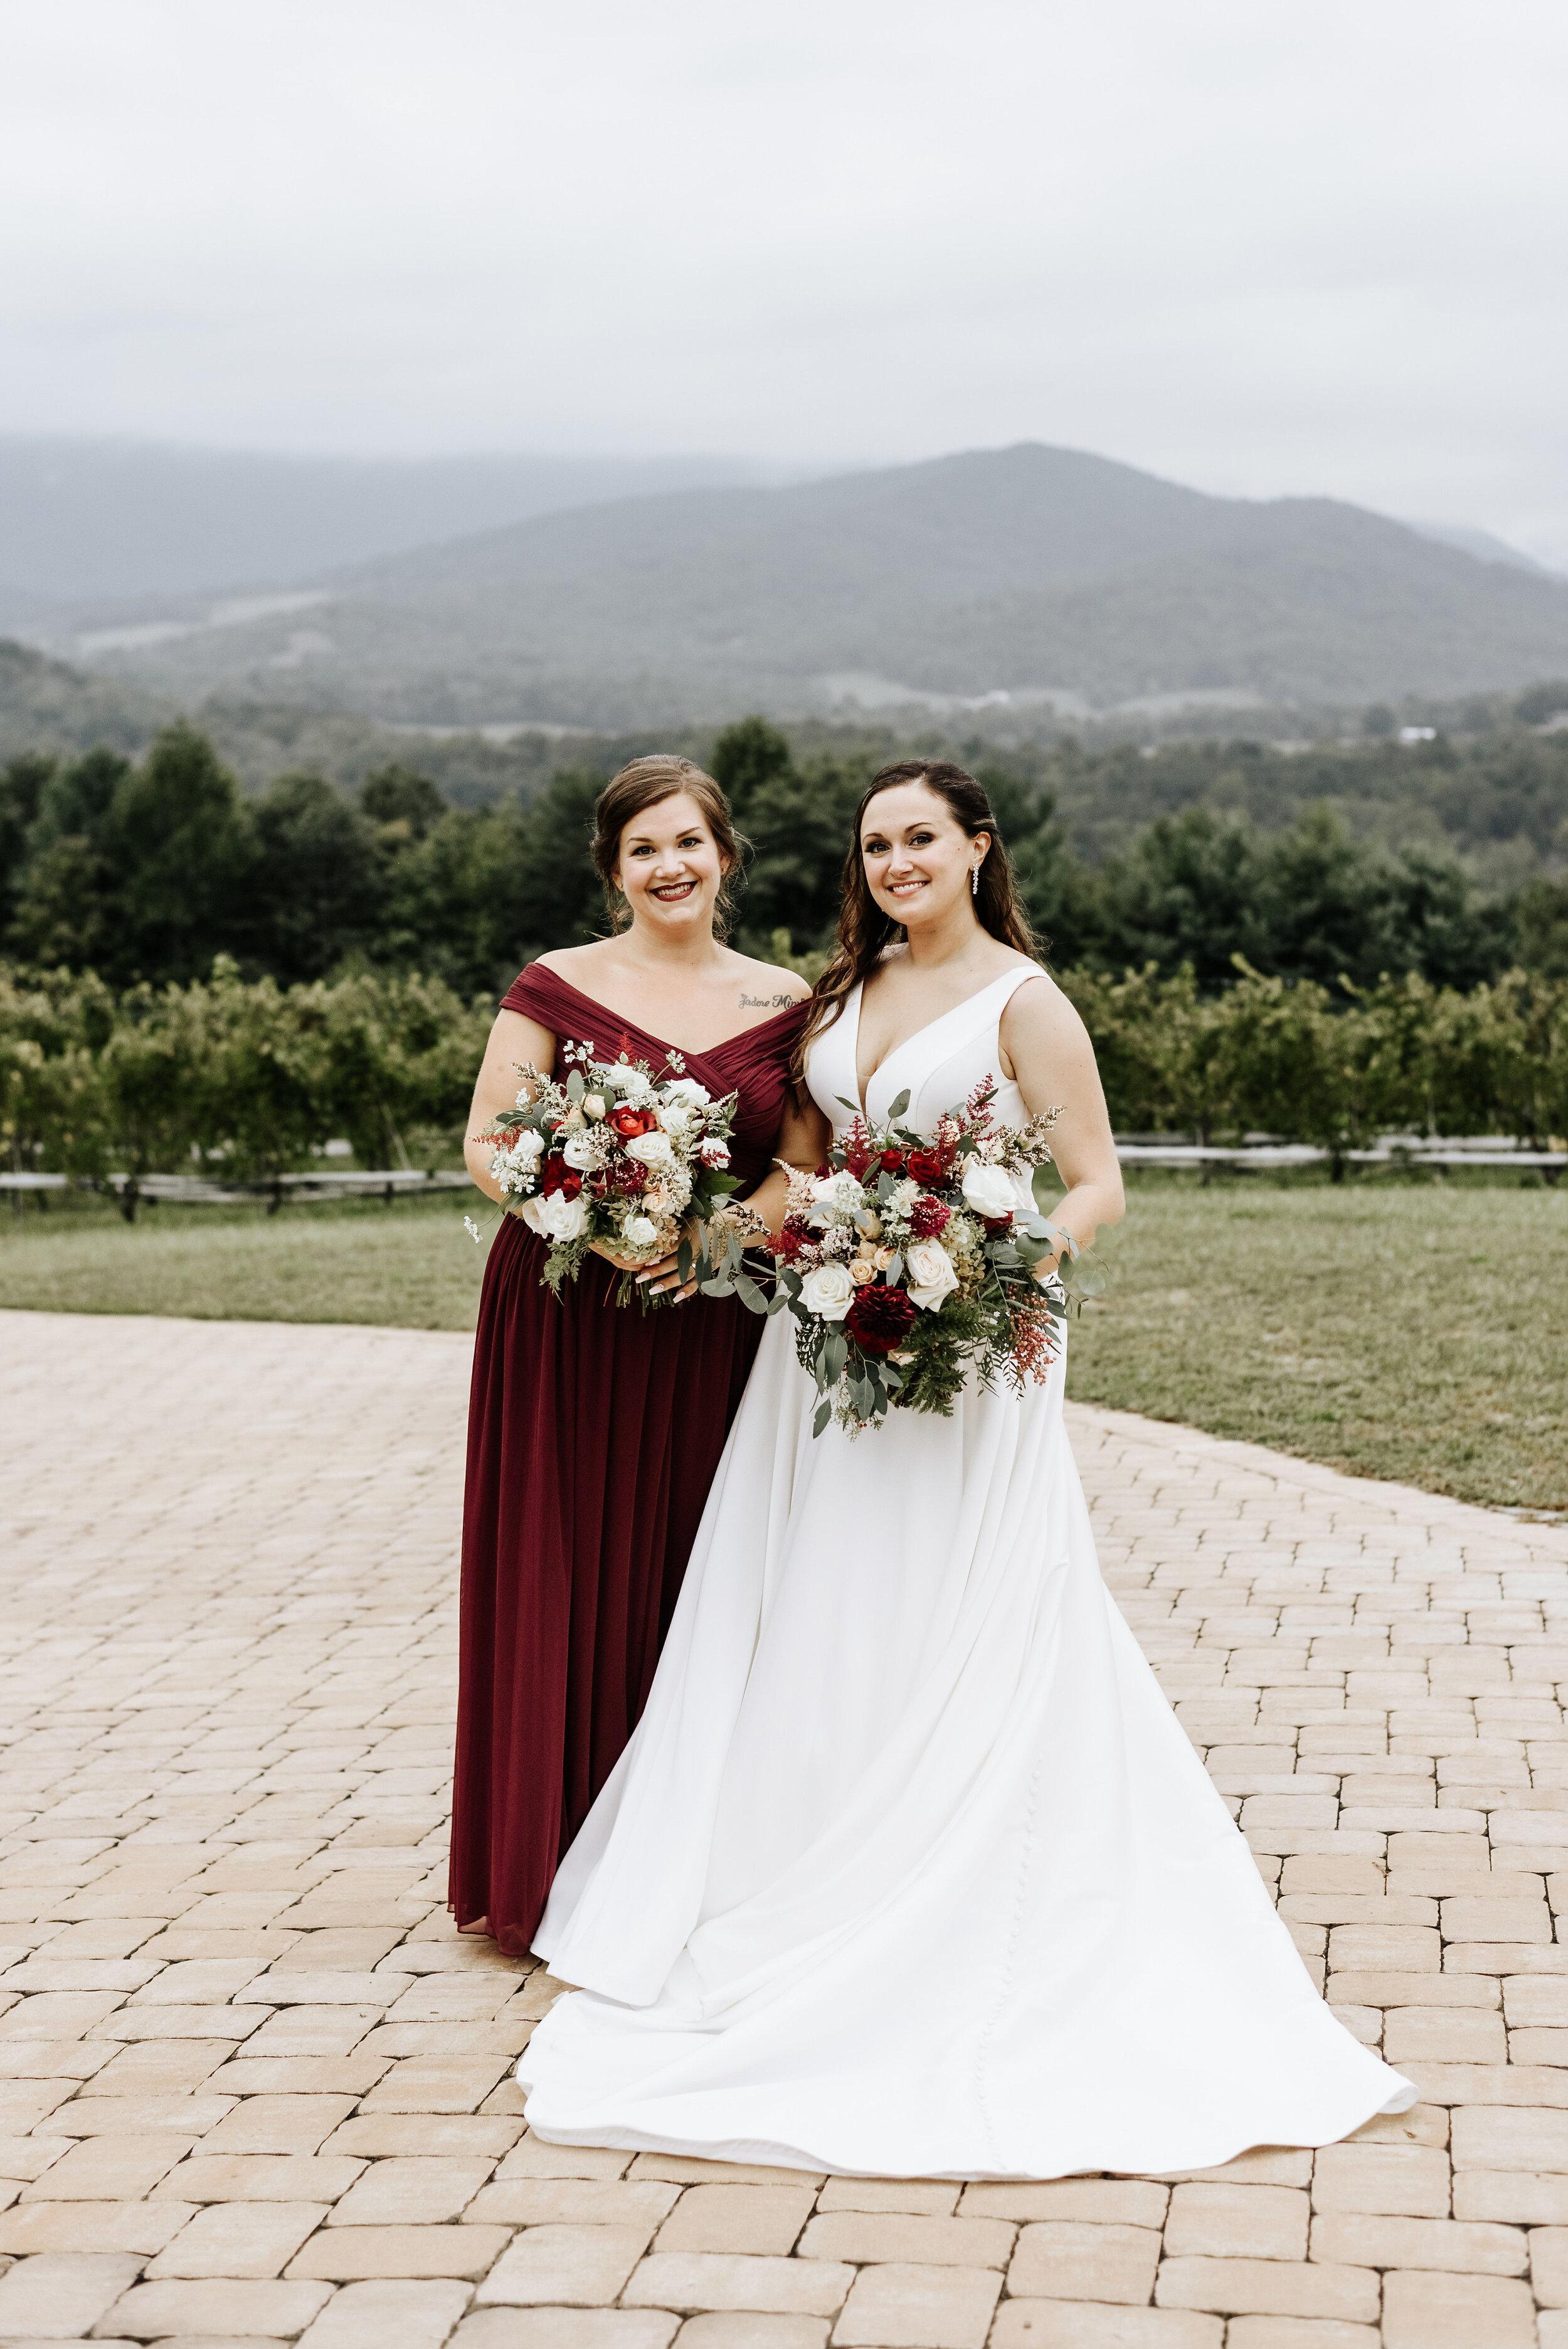 Allison_Nolan_Moss_Vineyards_Wedding_Charlottesville_Virginia_Photography_by_V_52.jpg